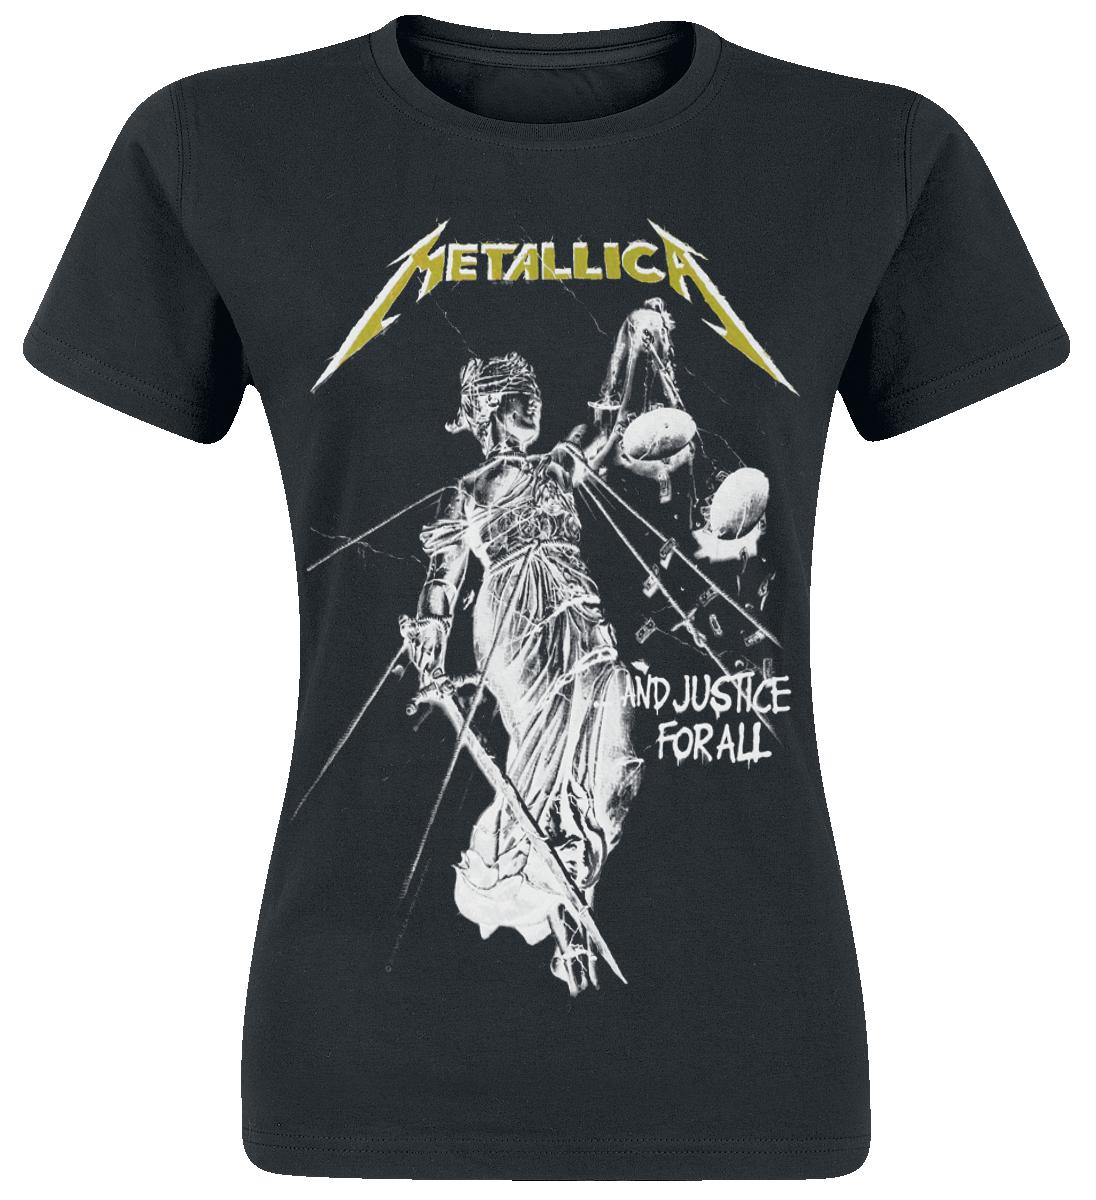 Metallica - Justice Classic - Girls shirt - black image